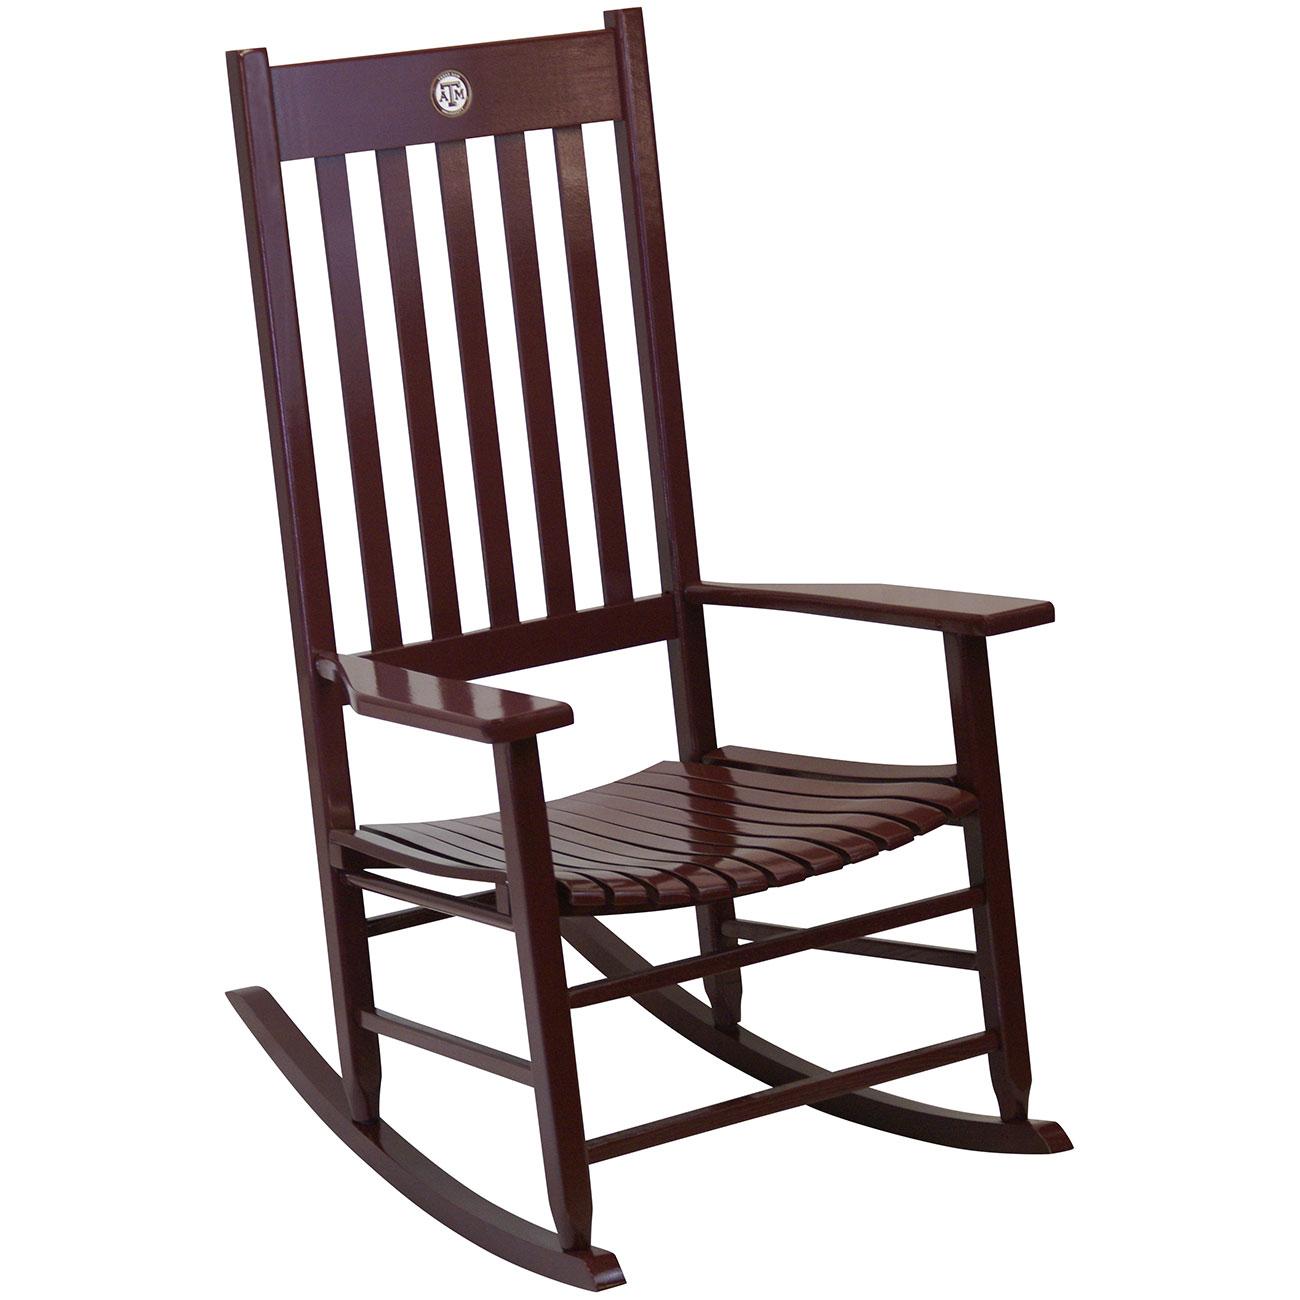 Prime Team Color Rocking Chair Texas Am Unemploymentrelief Wooden Chair Designs For Living Room Unemploymentrelieforg